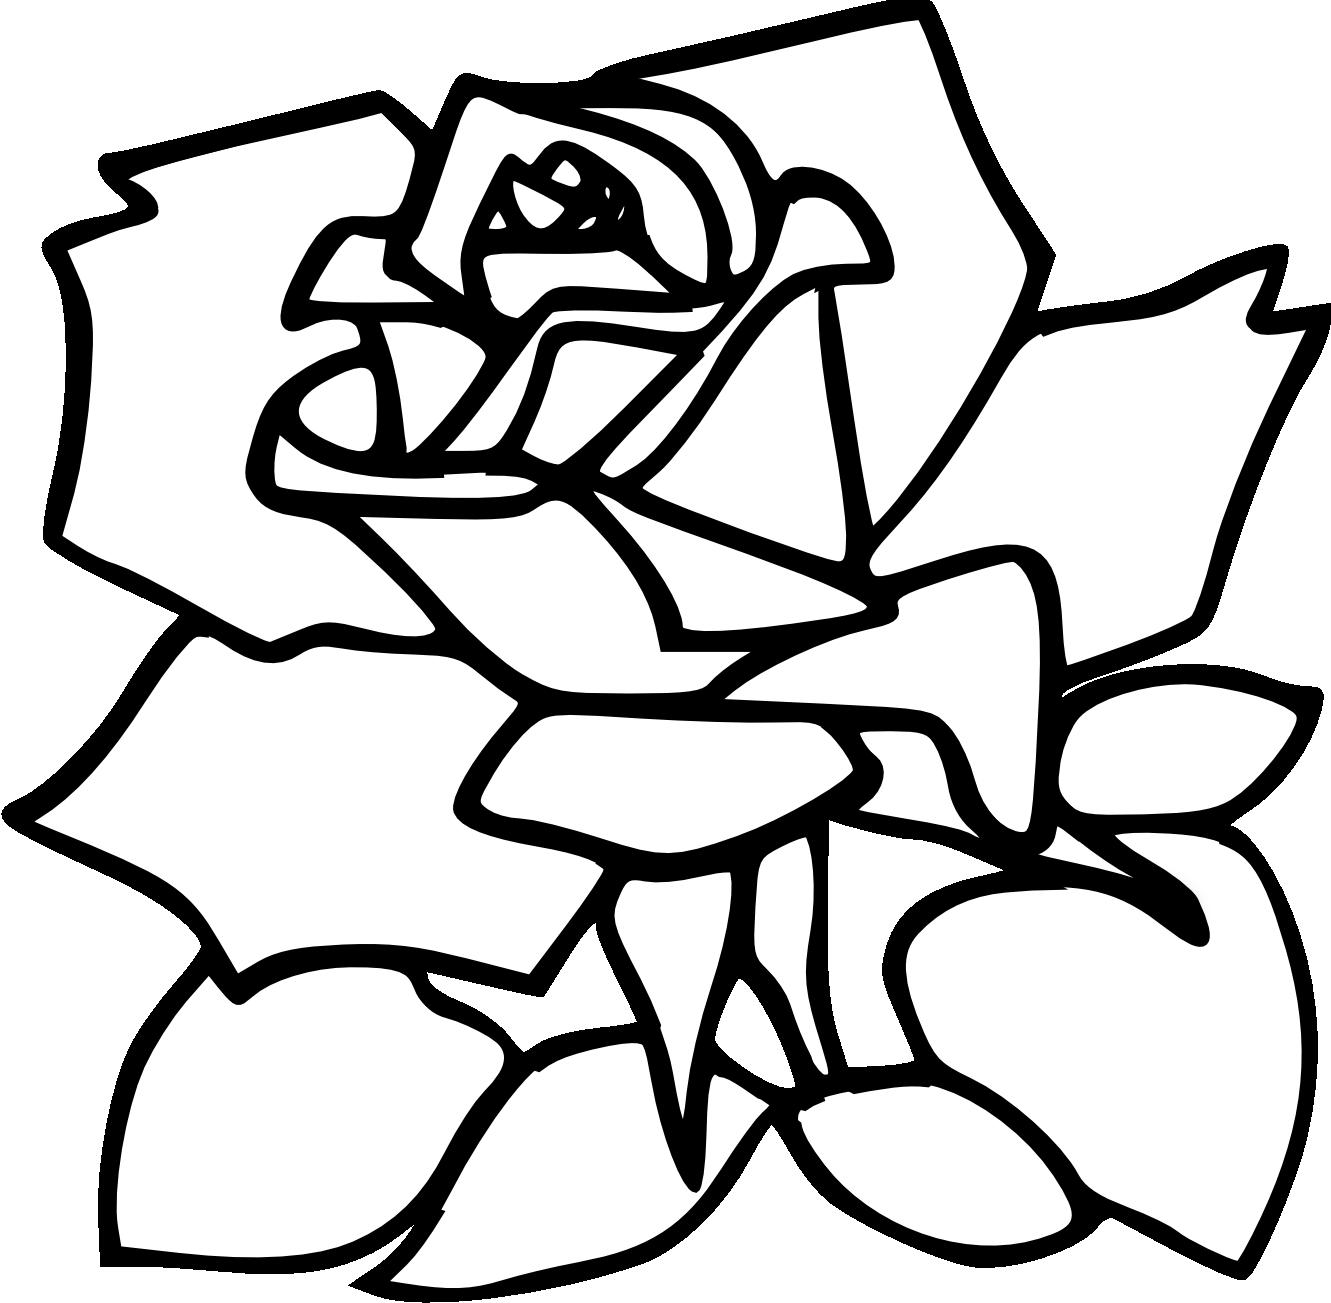 Line Art Rose Tattoo : Zeimusu red rose black white line art tattoo tatoo svg